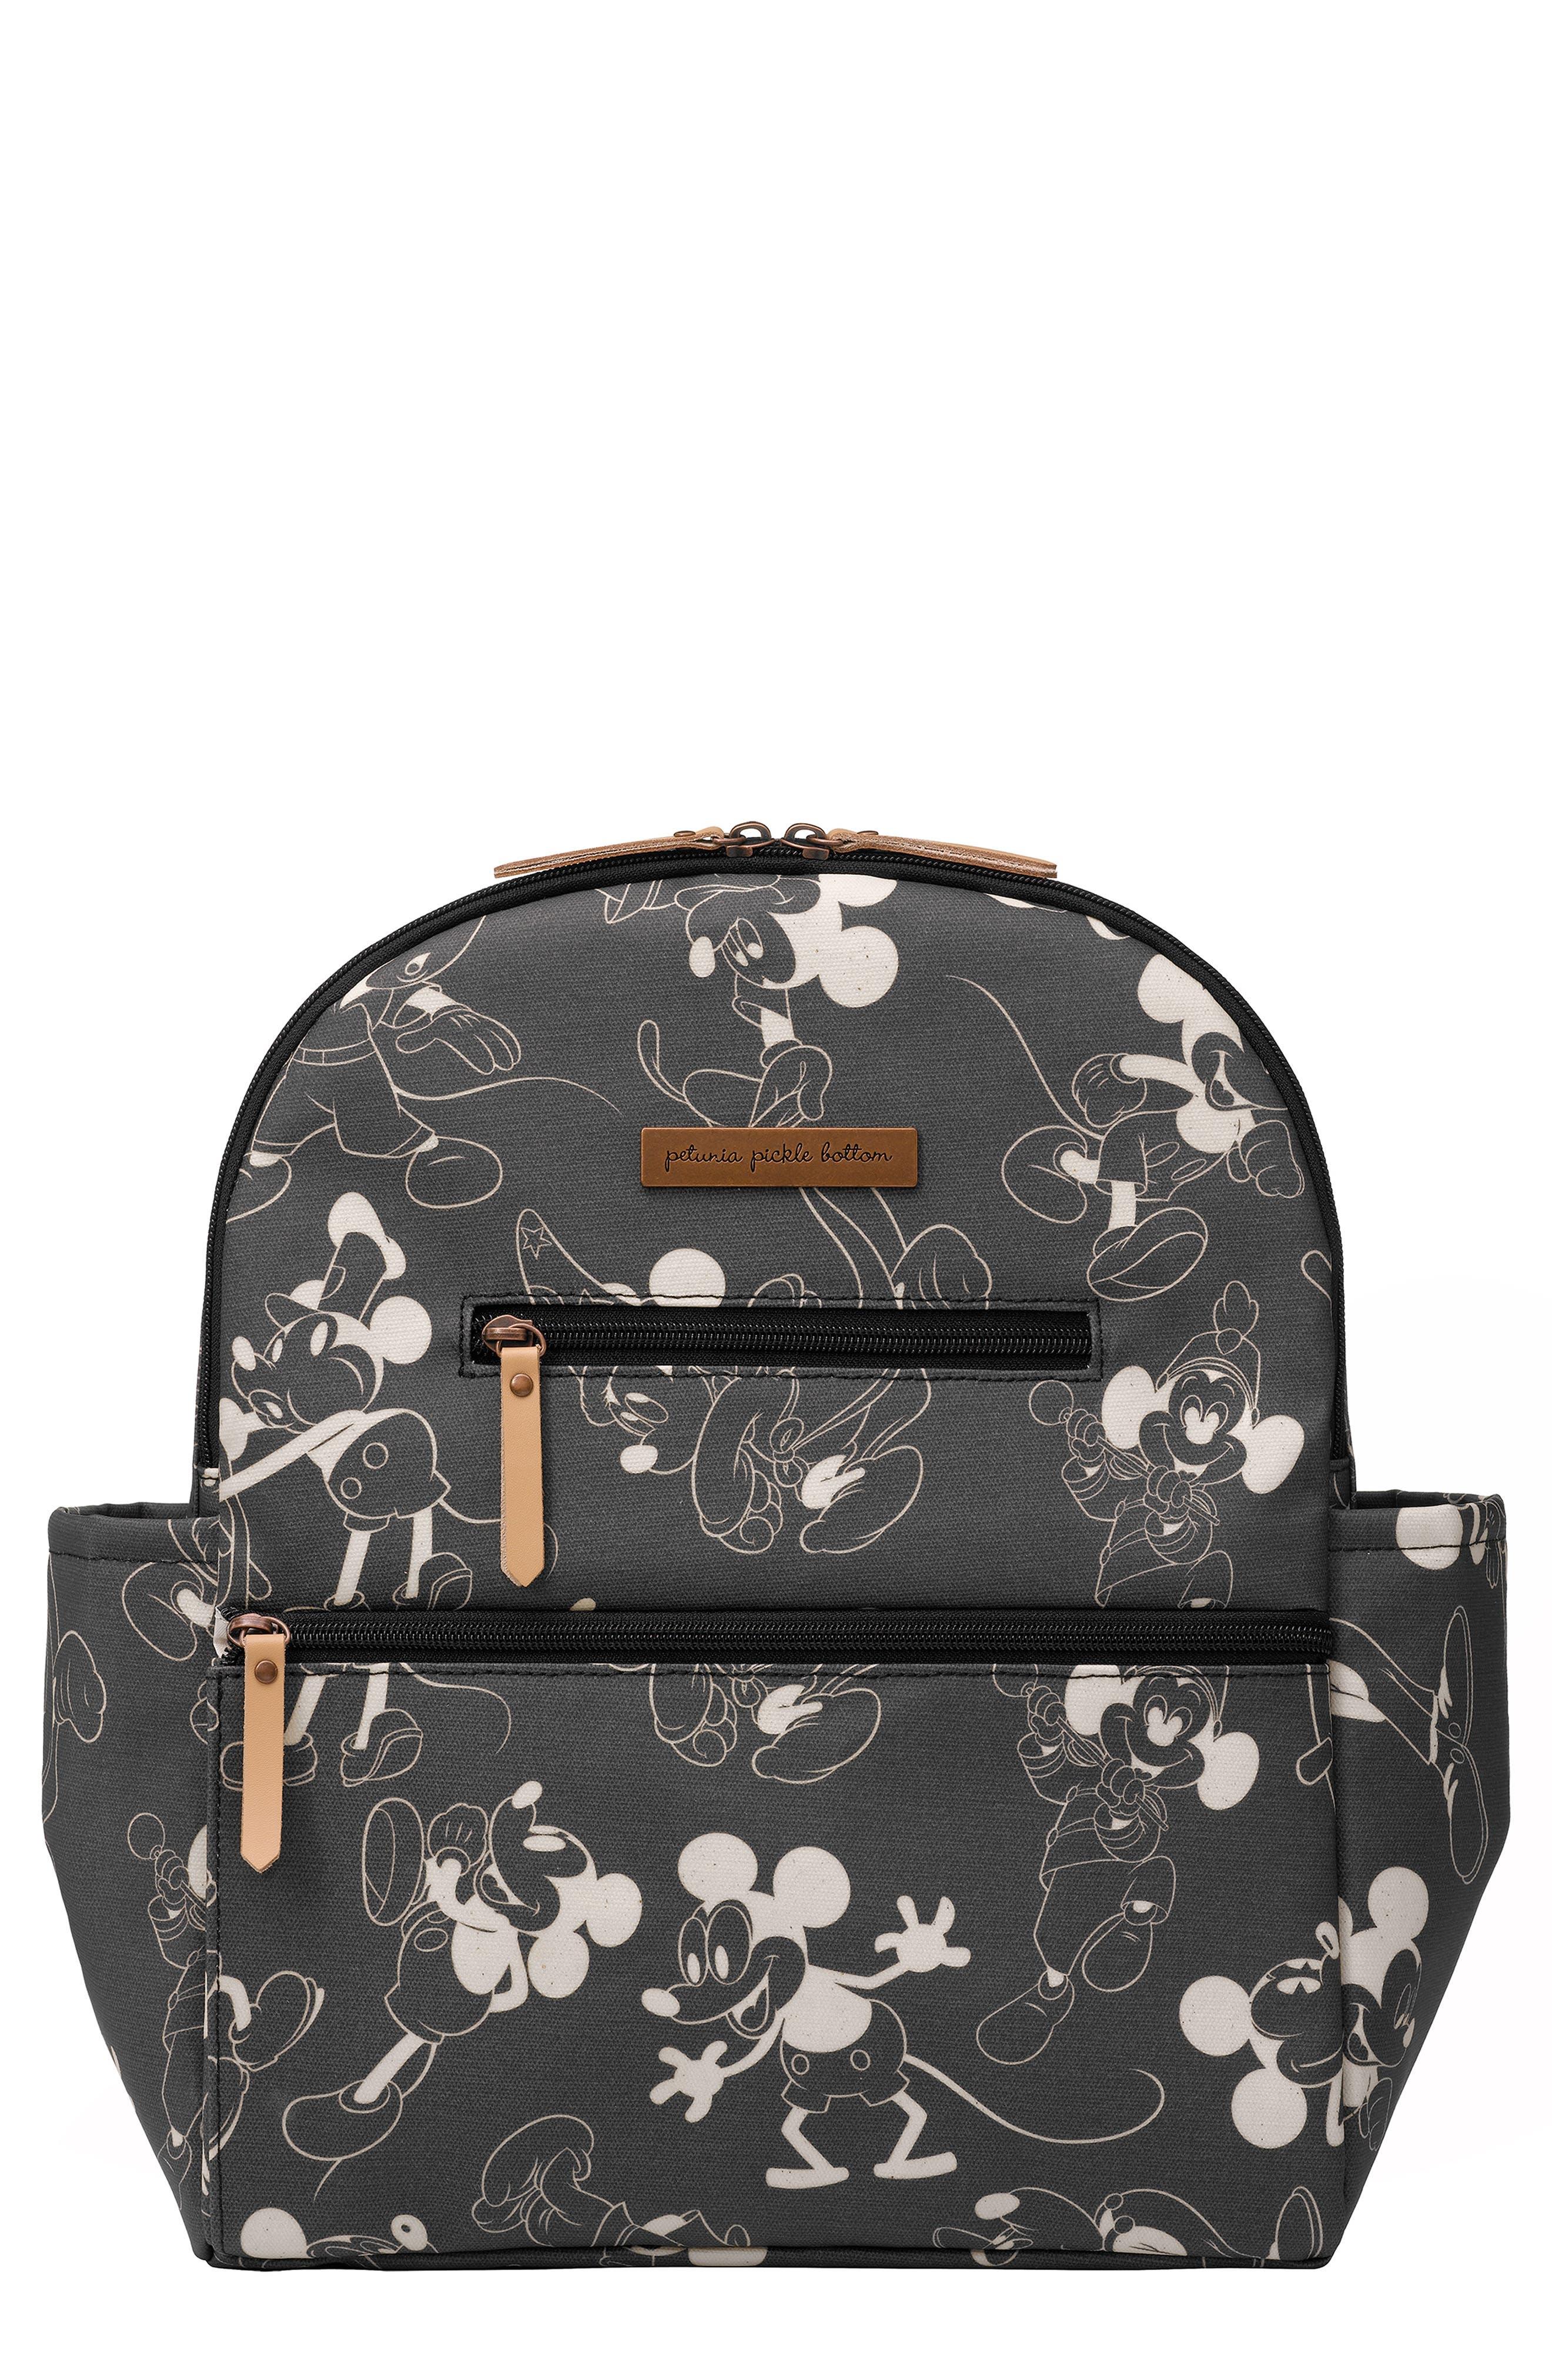 Infant Petunia Pickle Bottom Disney Collaboration Ace Backpack  Black